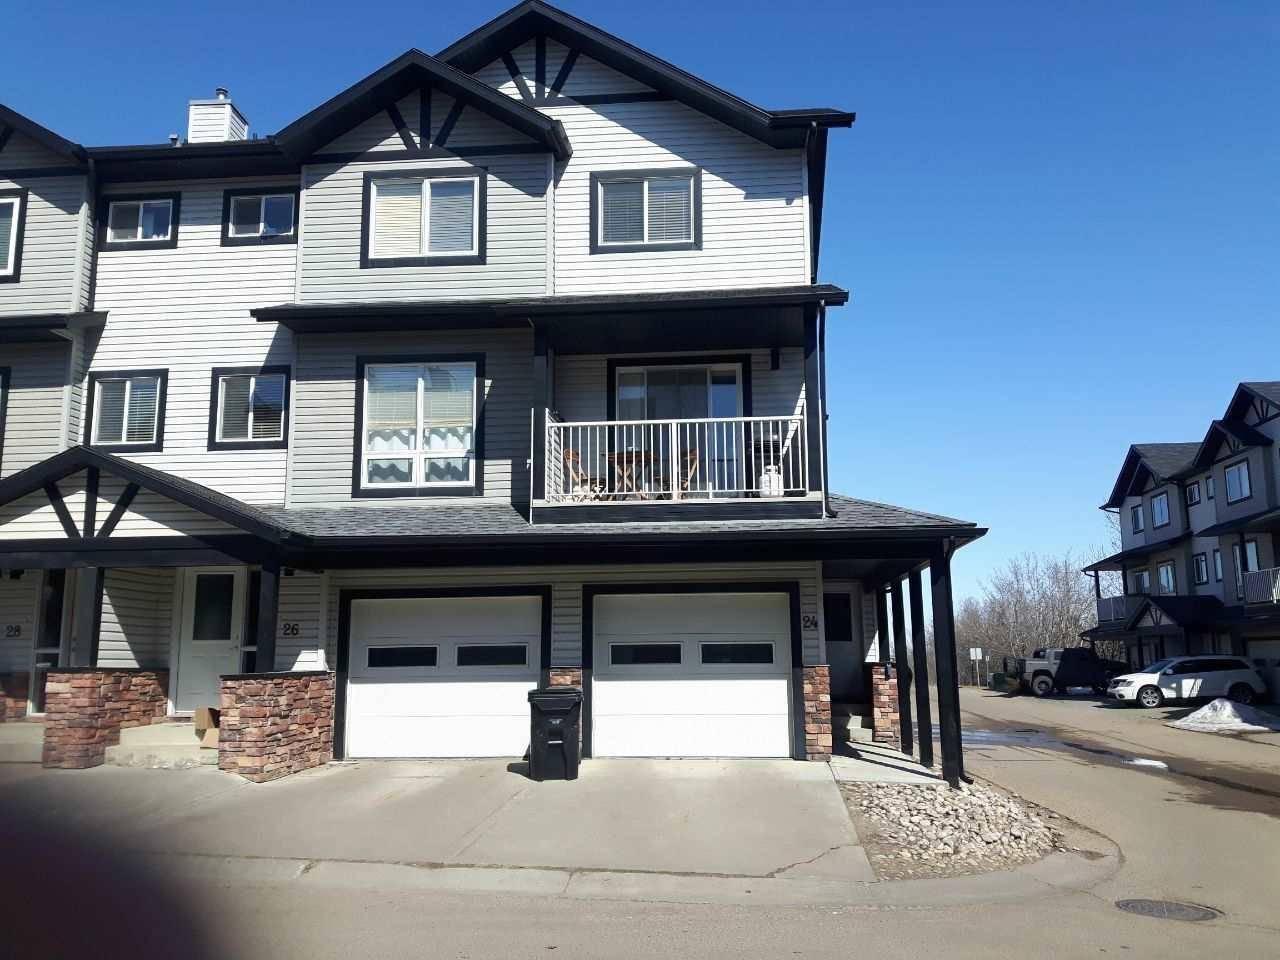 Townhouse for sale at 11 Clover Bar Ln Unit 24 Sherwood Park Alberta - MLS: E4194551